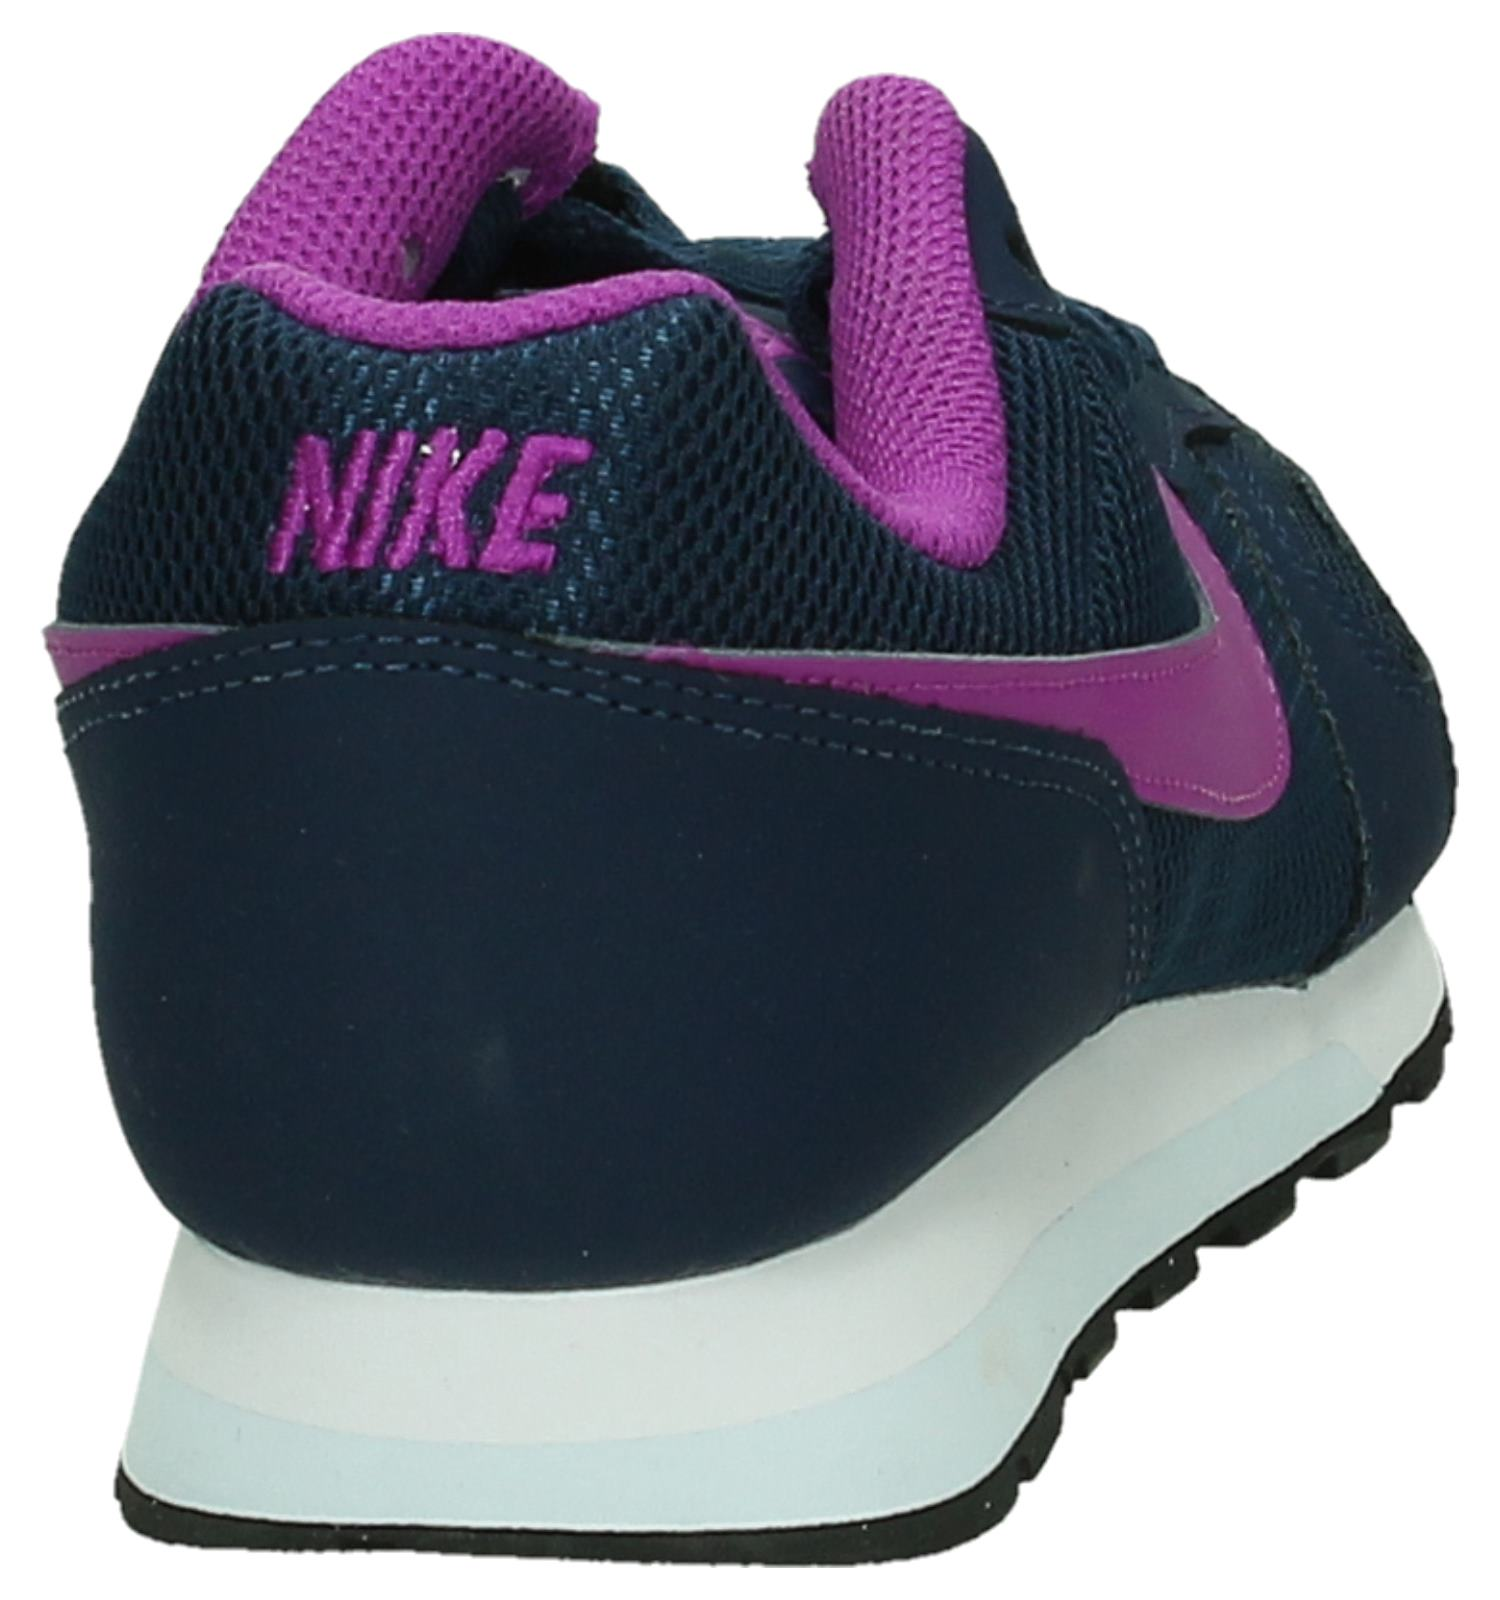 28b282a24e7 Nike MD Runner 2 Blauwe Sneakers   TORFS.BE   Gratis verzend en retour